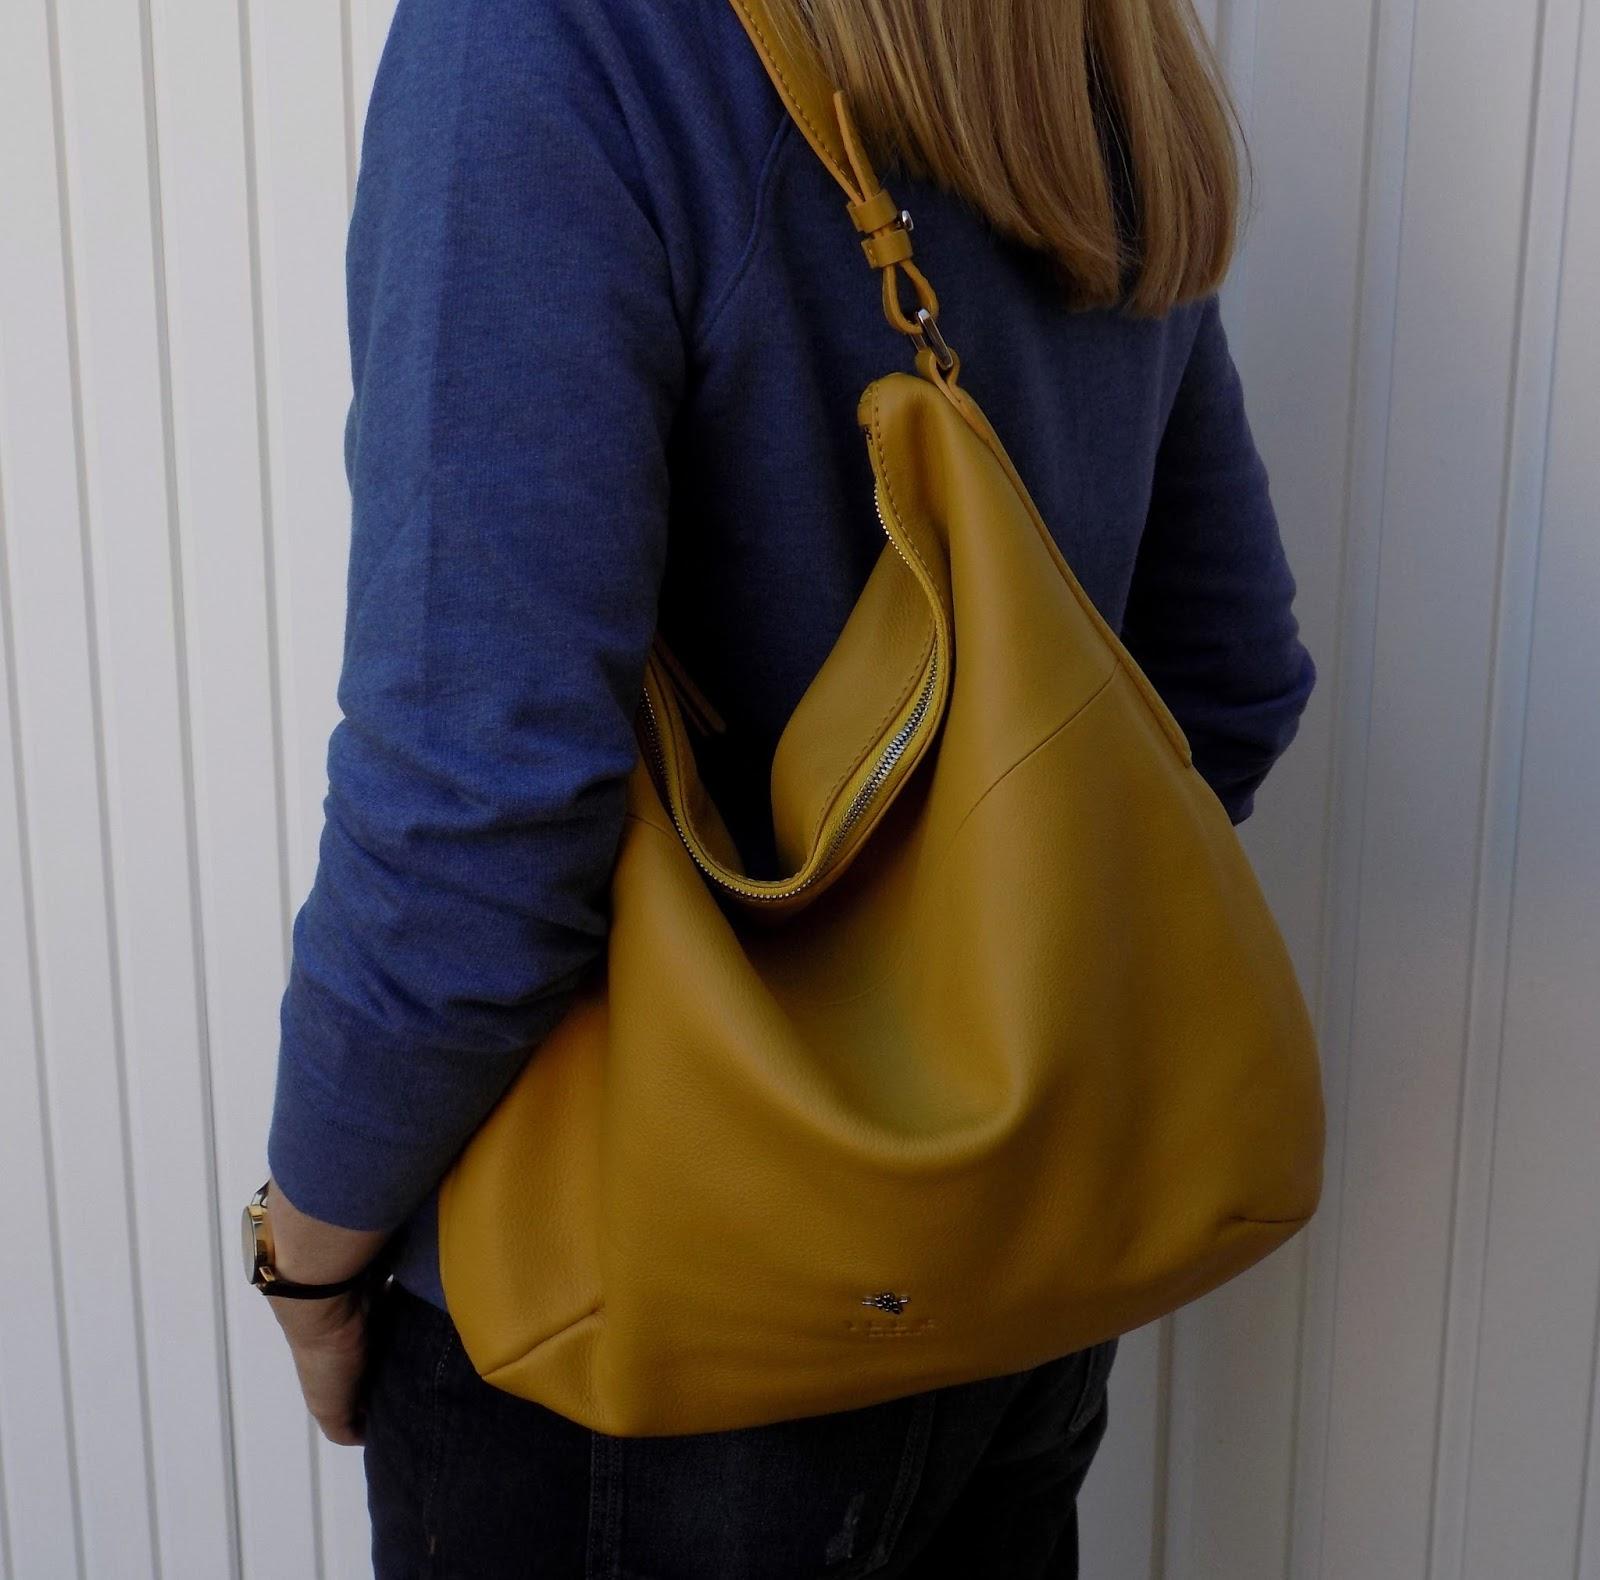 Boden slogan sweatshirt with boyfriend jeans, yellow Yull shoes and yellow handbag